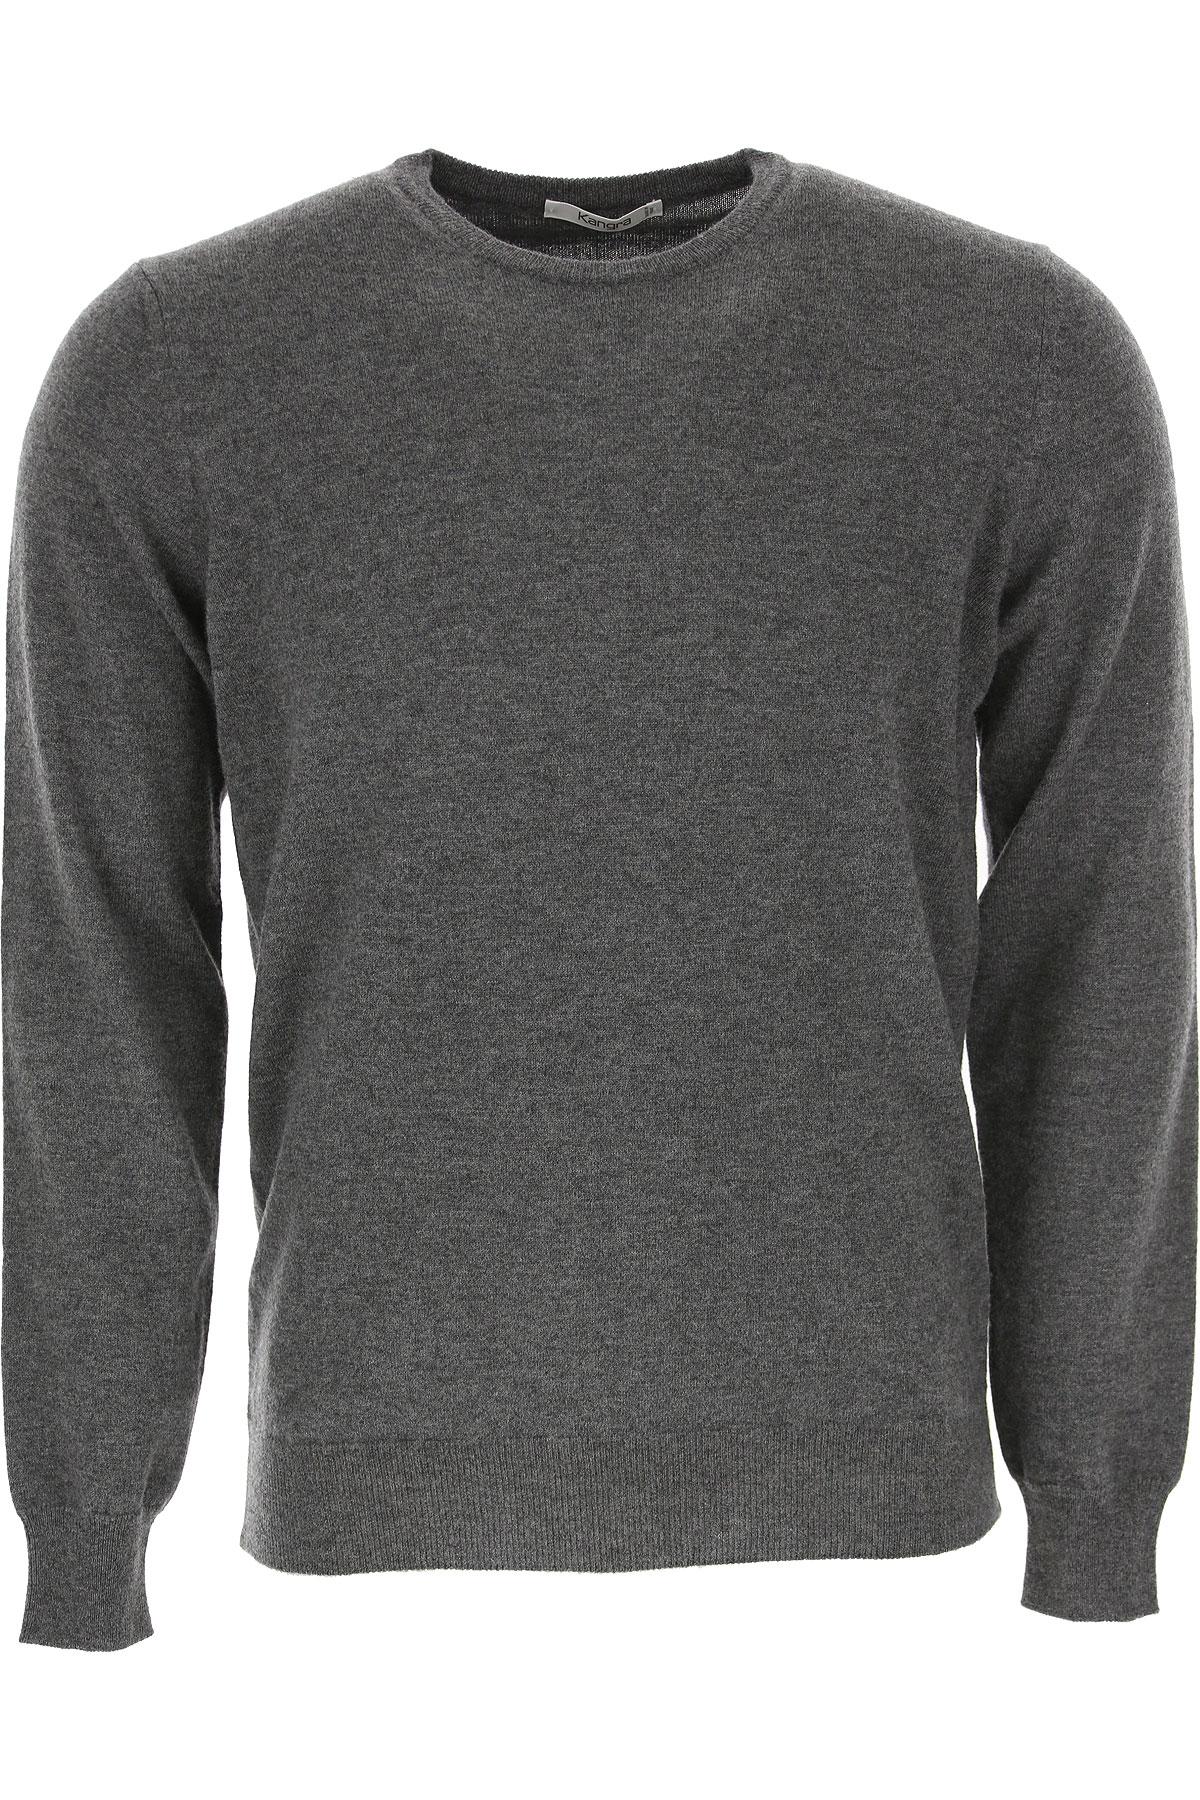 Kangra Sweater for Men Jumper On Sale, Grey, Merinos Wool, 2019, XL XXL XXXL